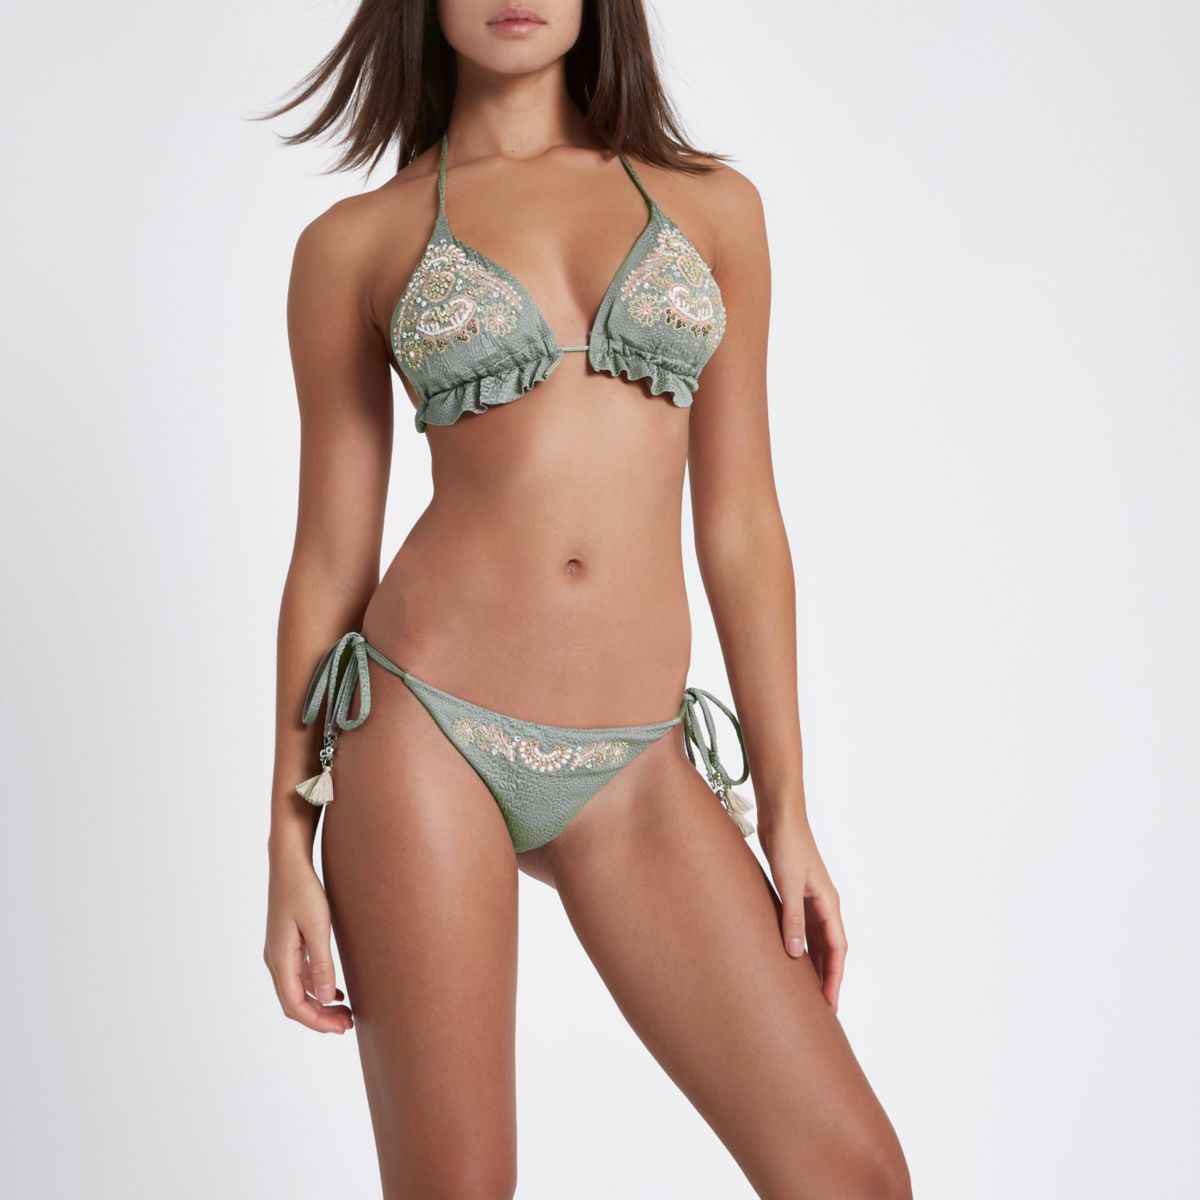 Kaki verfraaid bikinibroekje met bandjes opzij